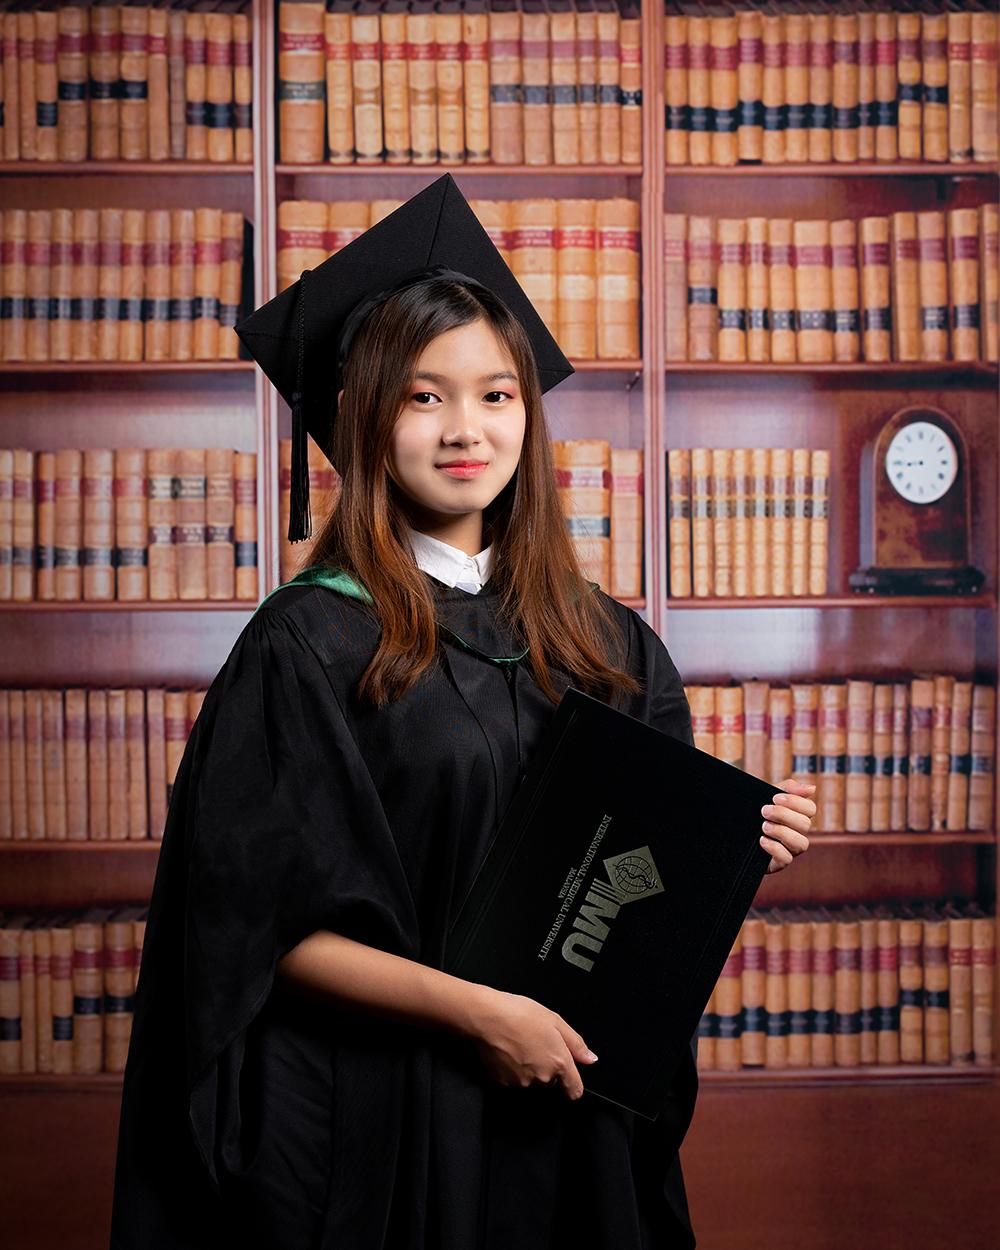 Graduation Photo by Loominos Studio